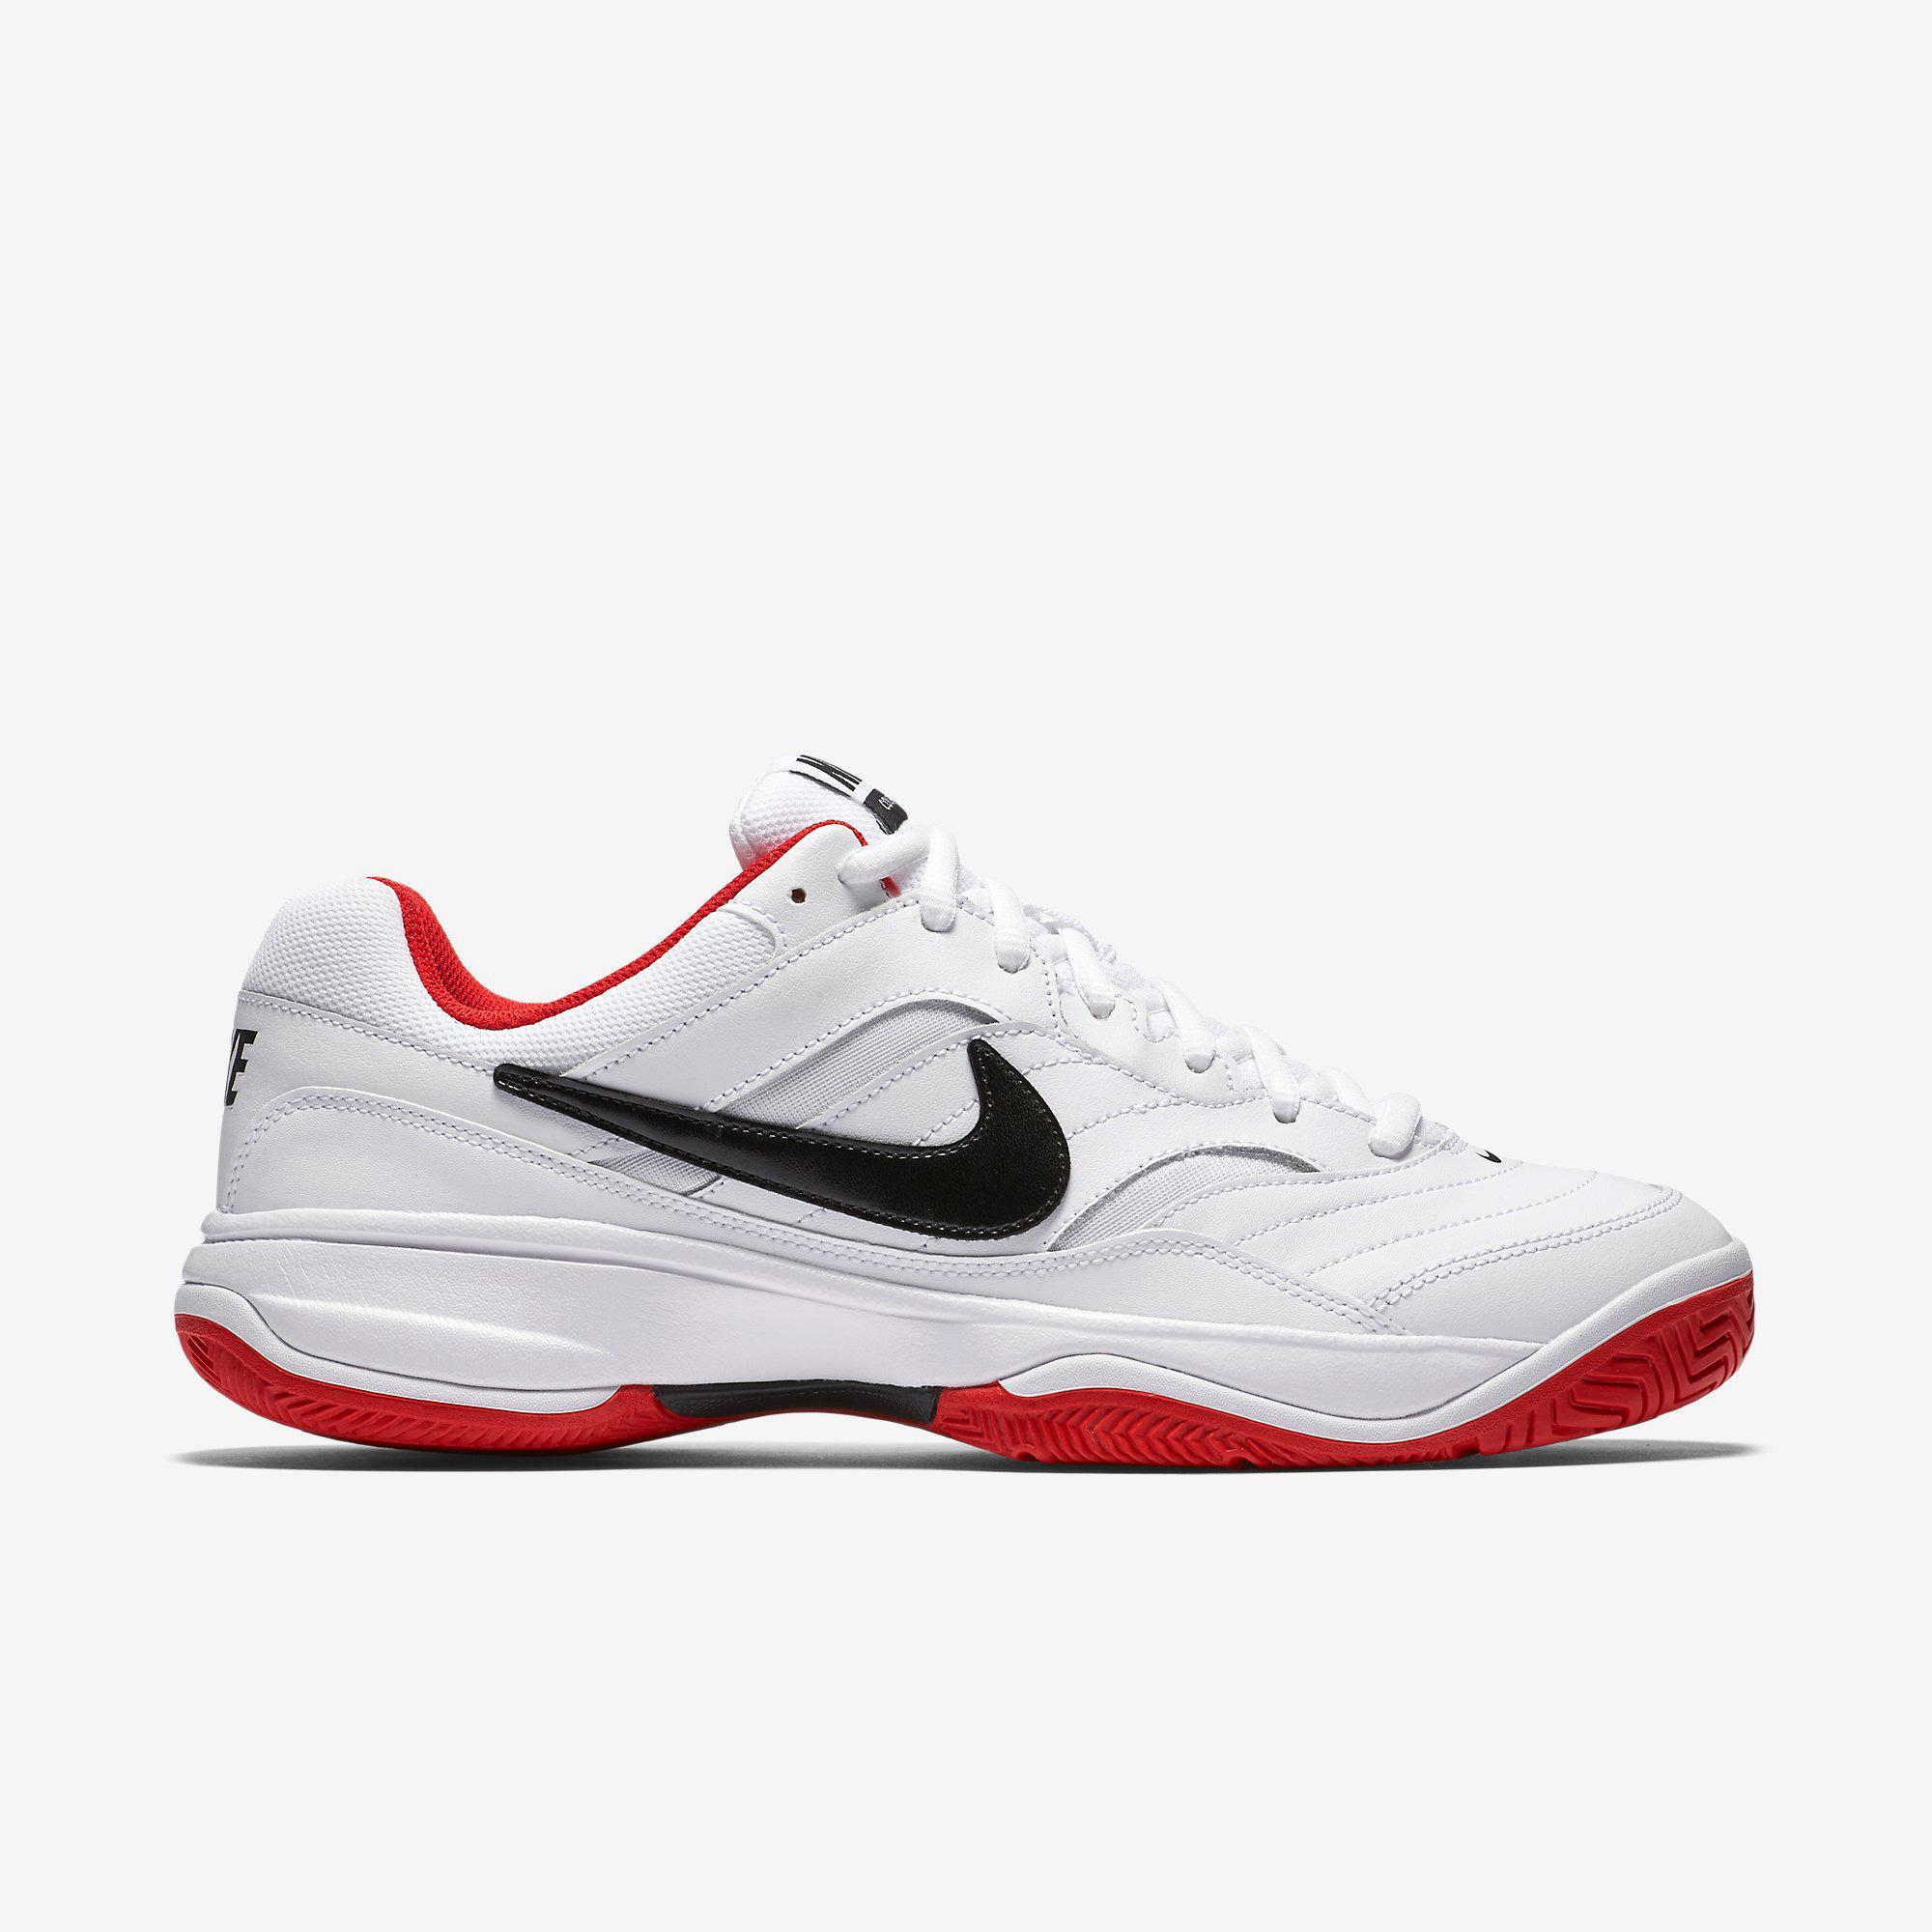 nike mens court lite tennis shoes white black uni red. Black Bedroom Furniture Sets. Home Design Ideas